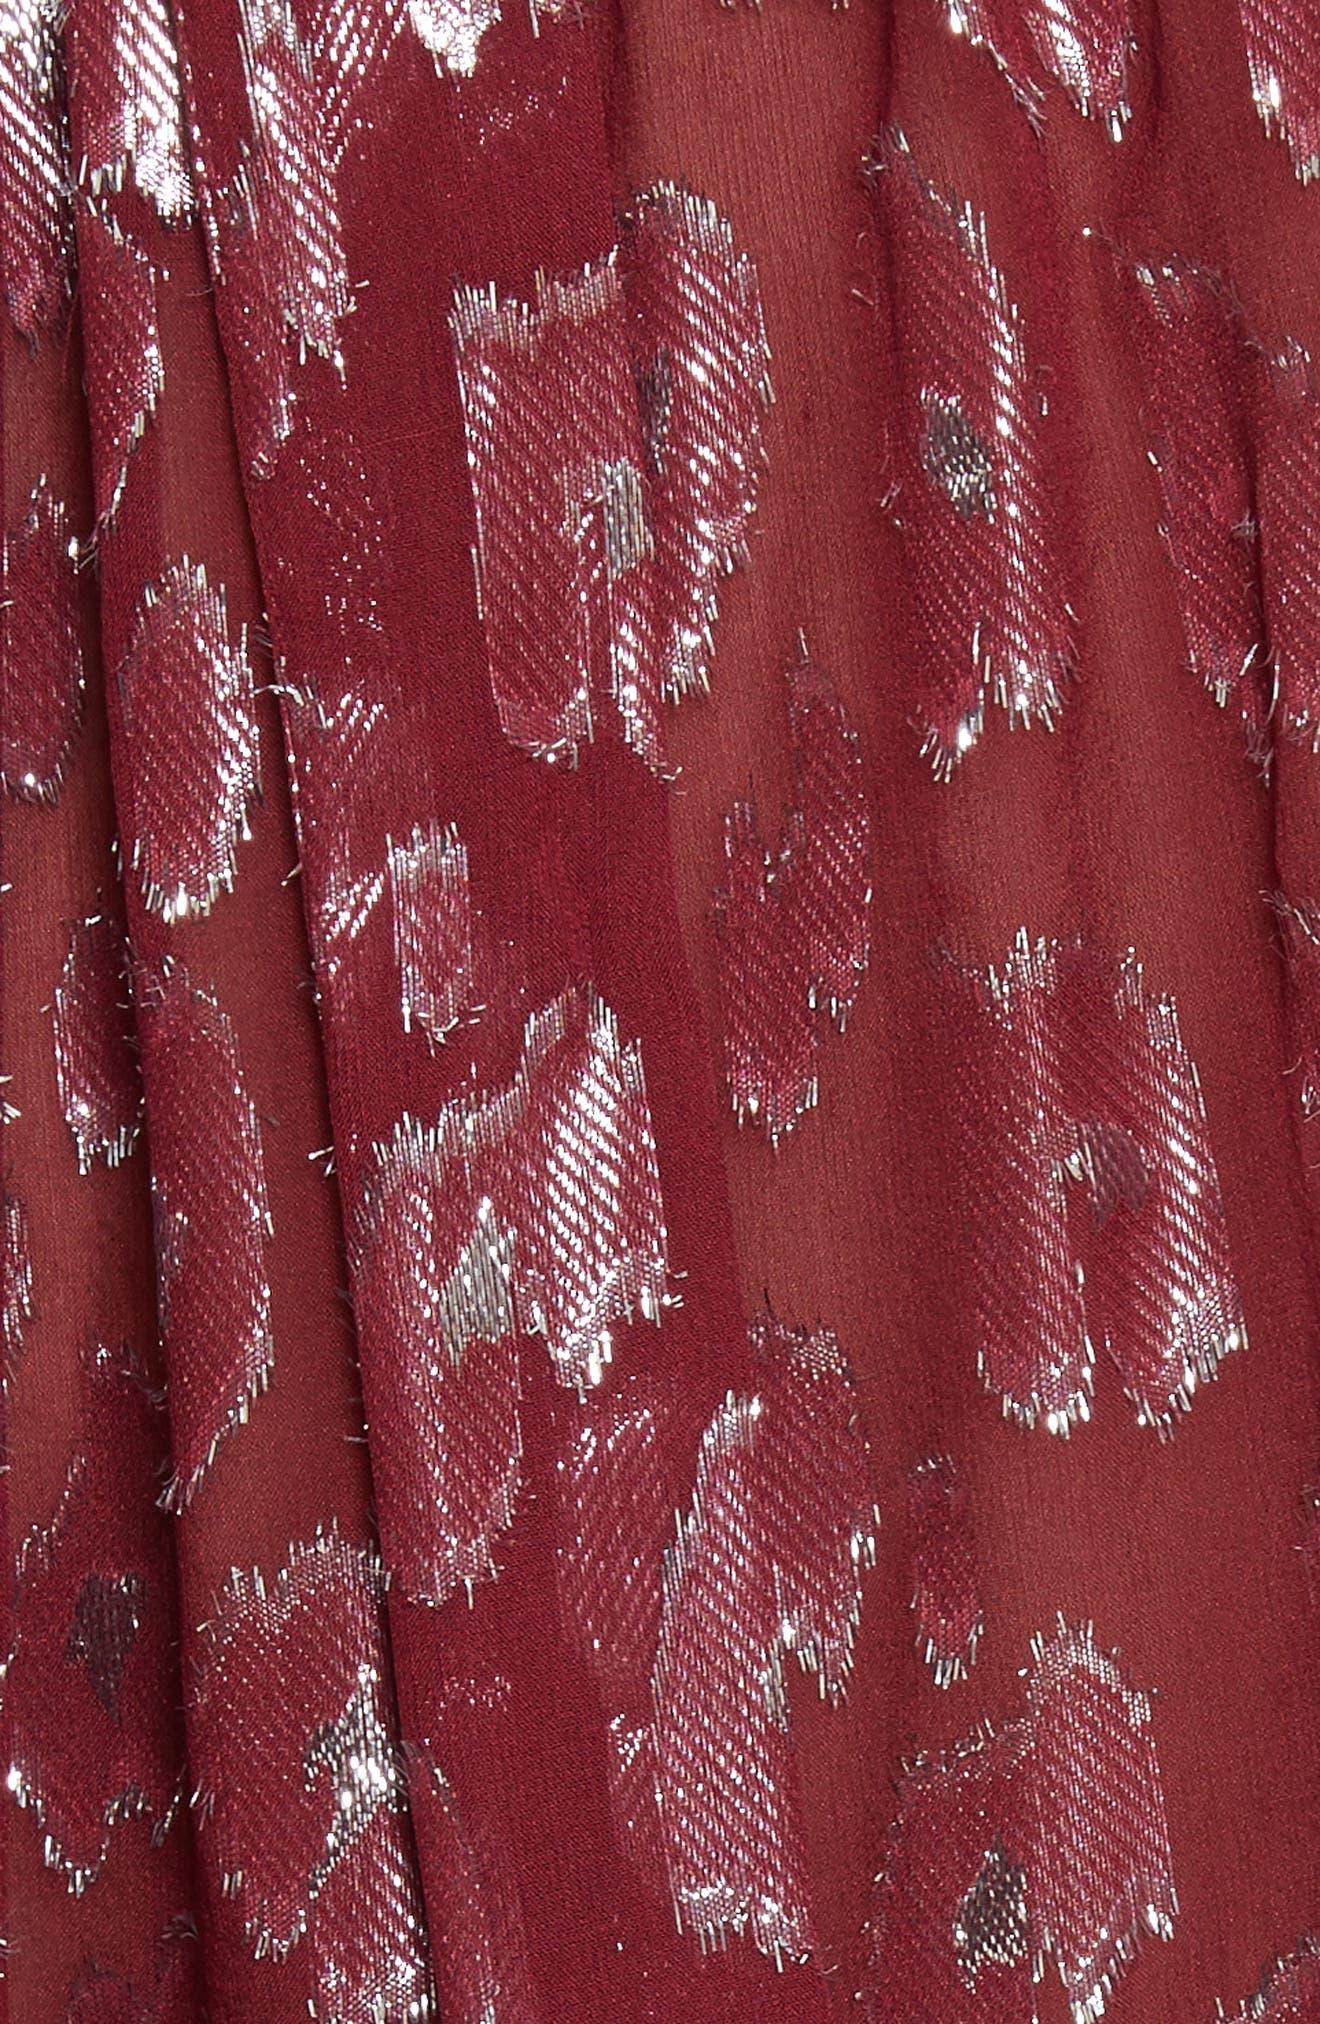 Brooks Metallic Silk Blouse,                             Alternate thumbnail 5, color,                             641